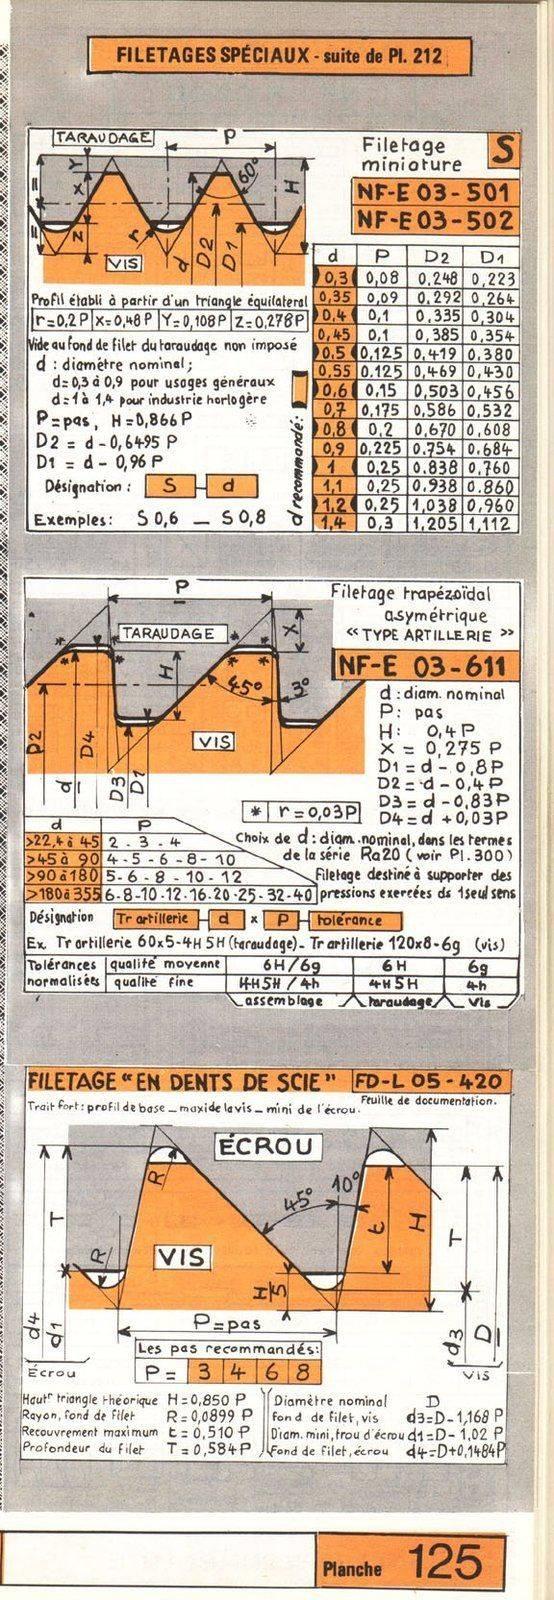 Filetages speciaux 2.jpg